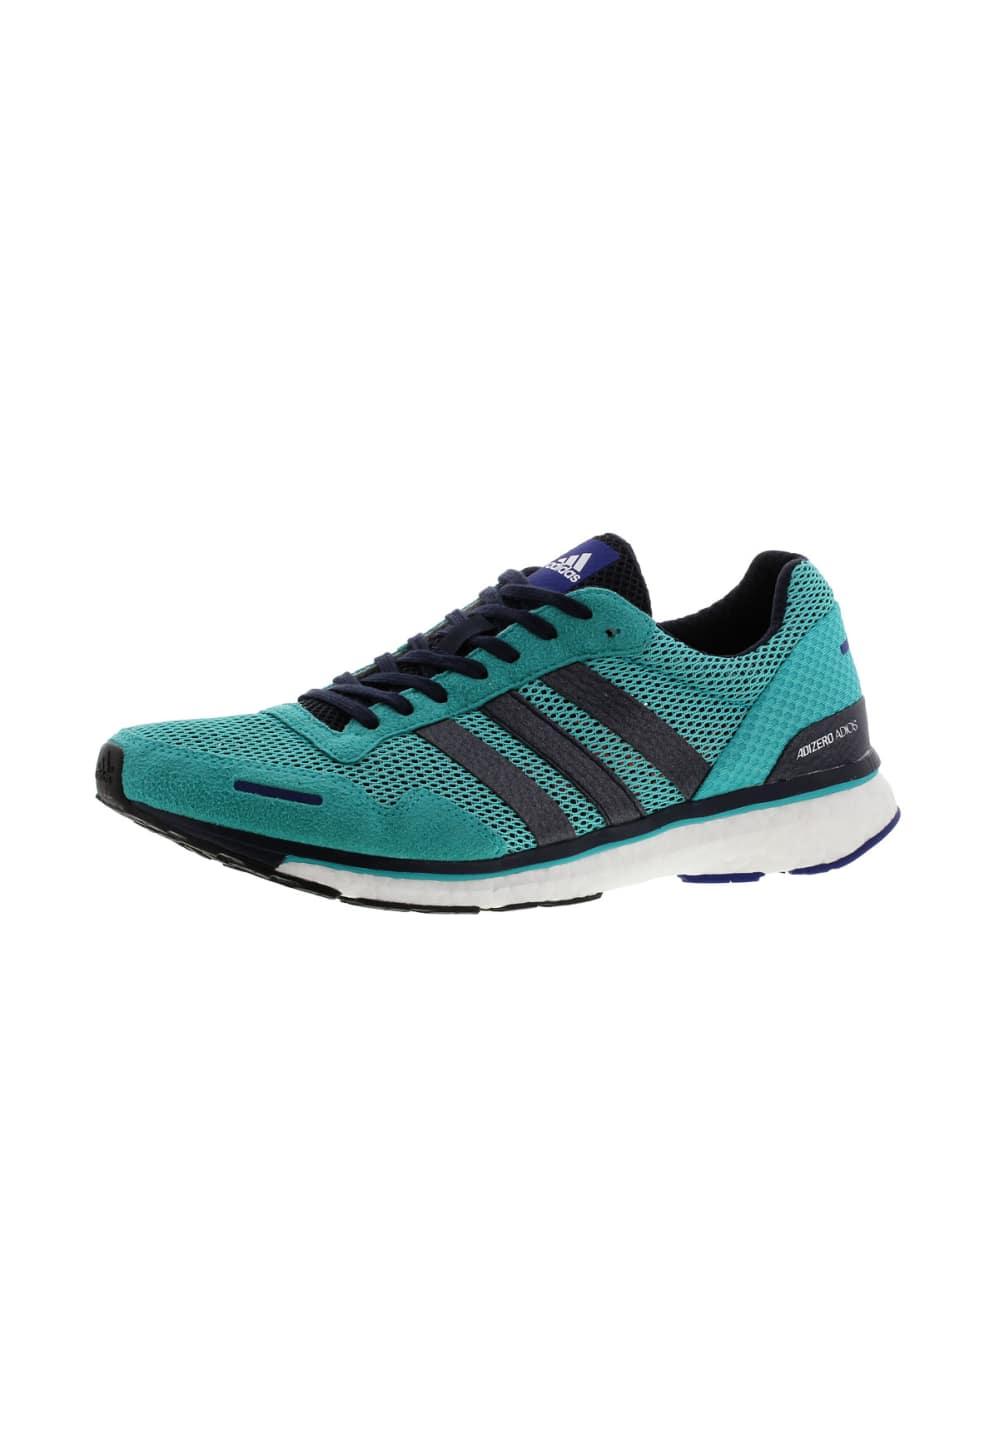 6d200539a adidas Adizero Adios 3 - Running shoes for Men - Green